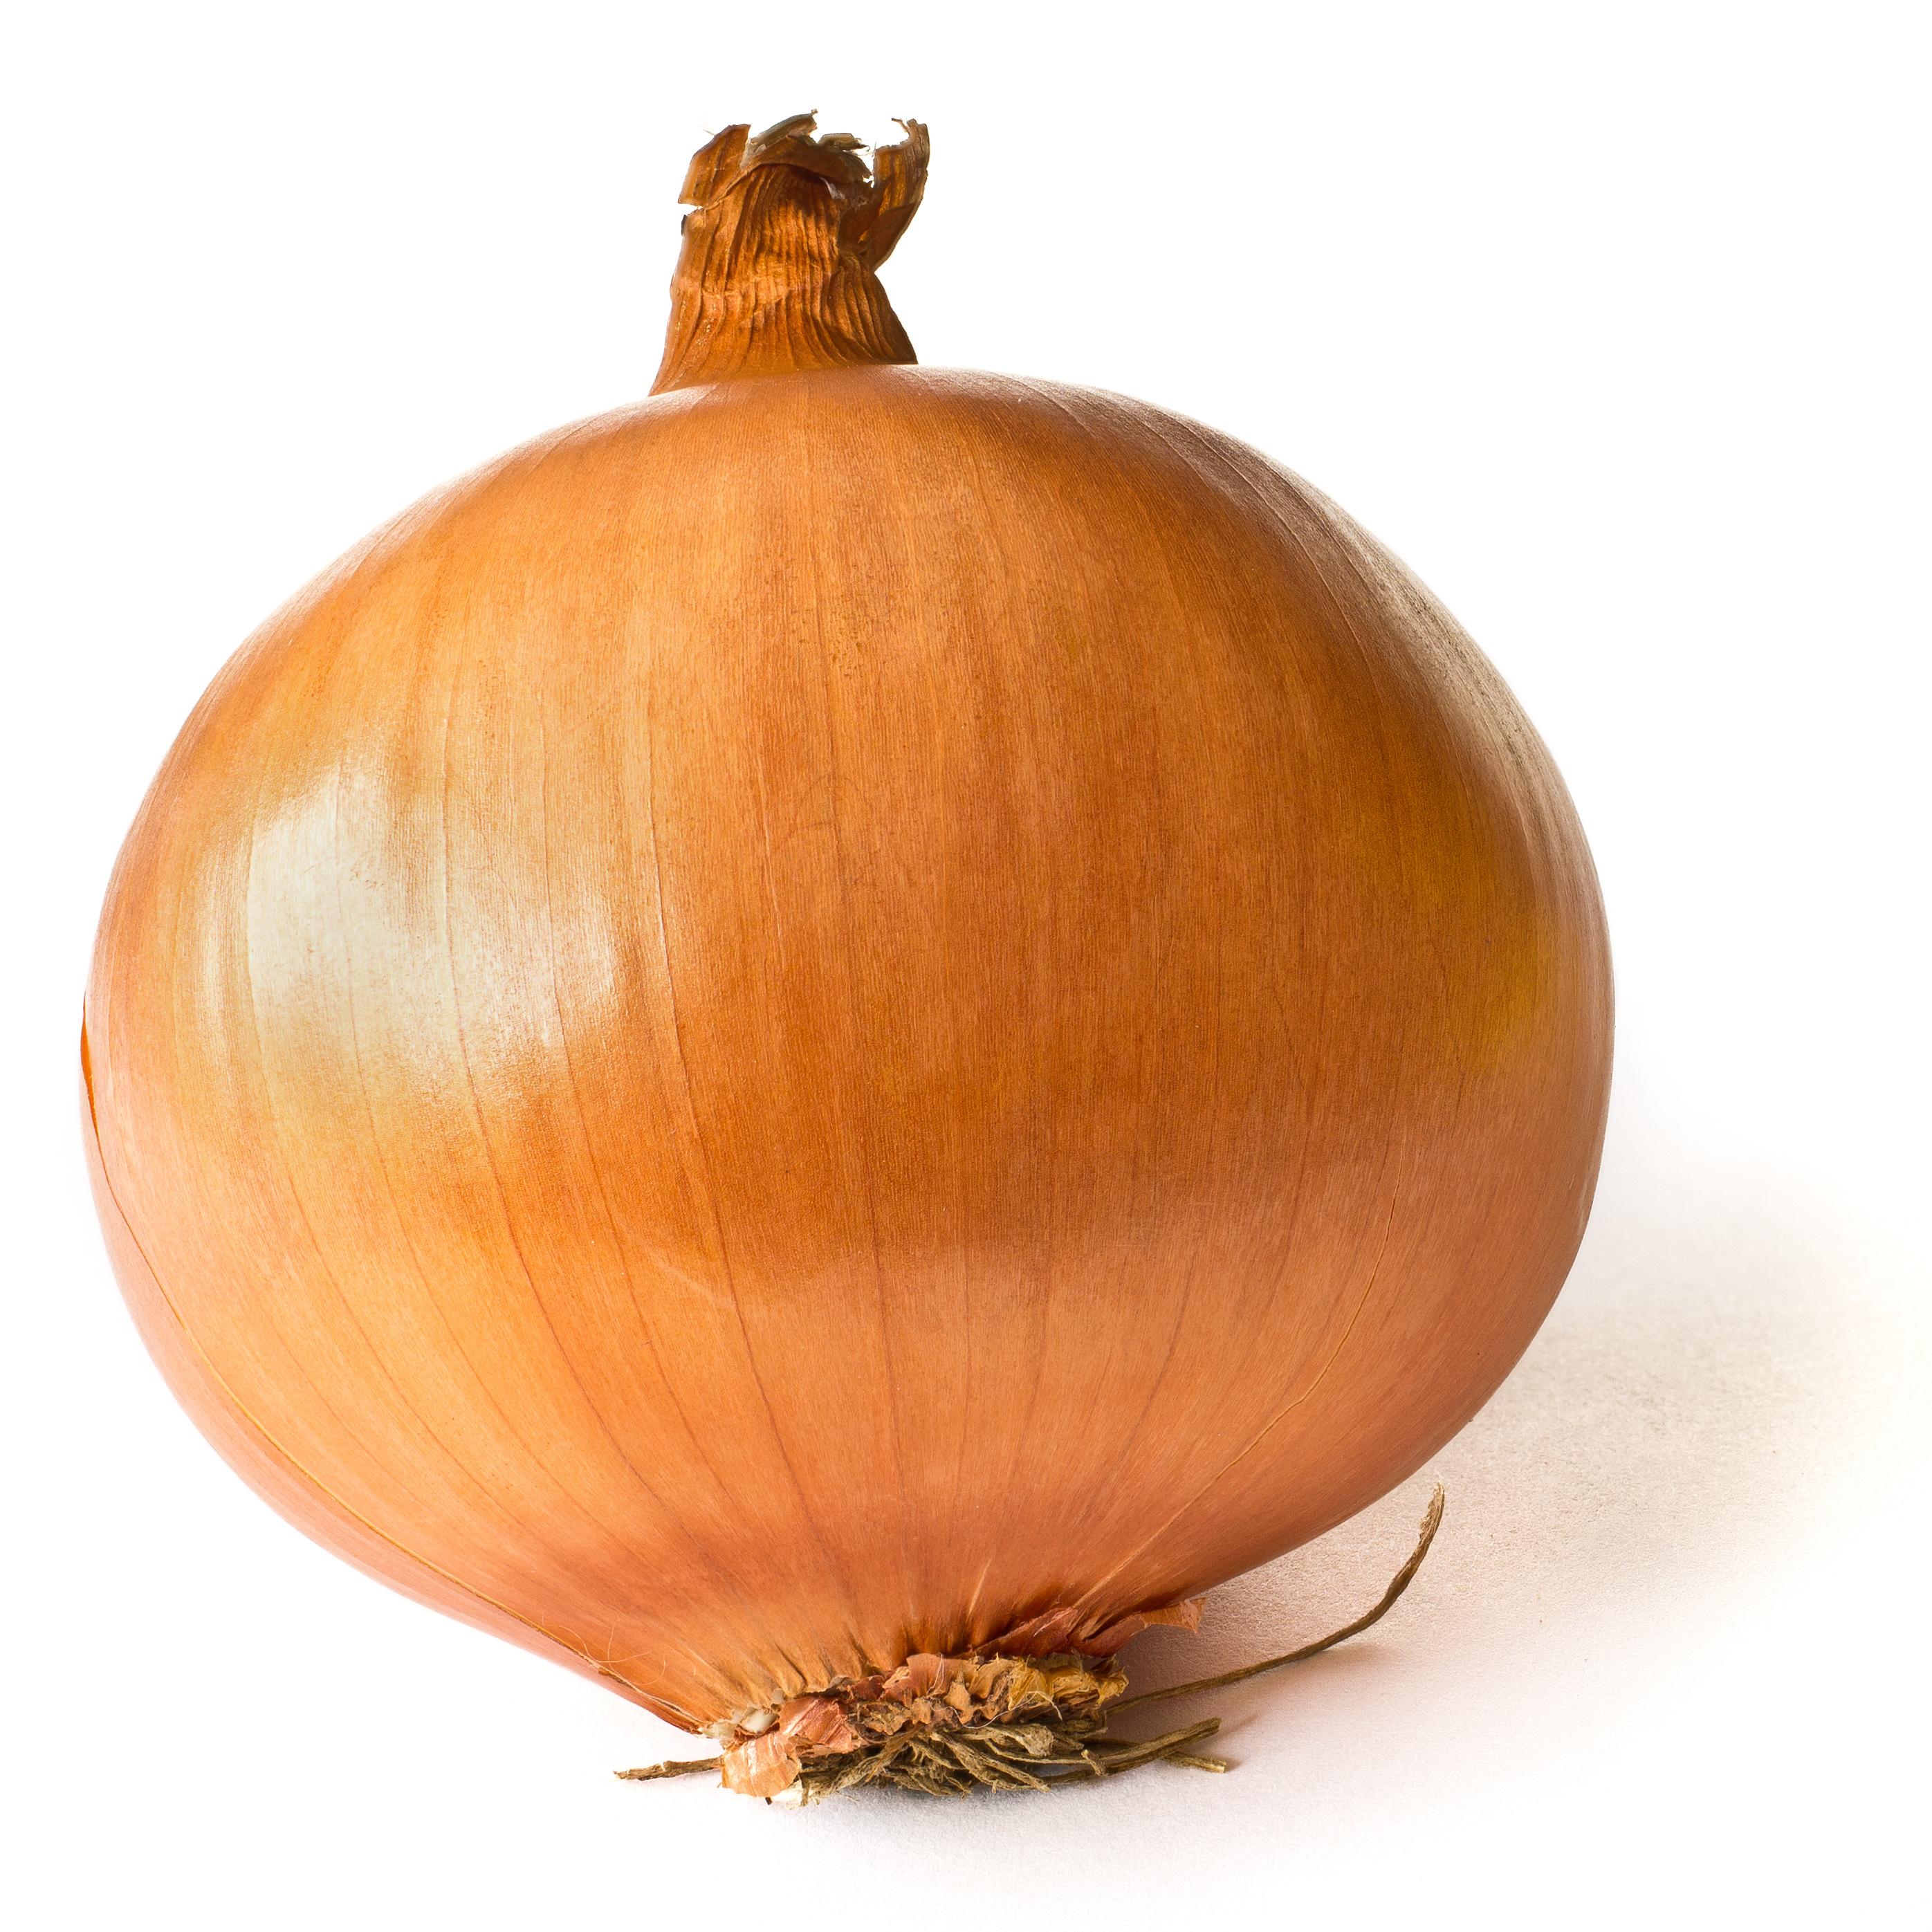 hidden onionib porn wiki tor